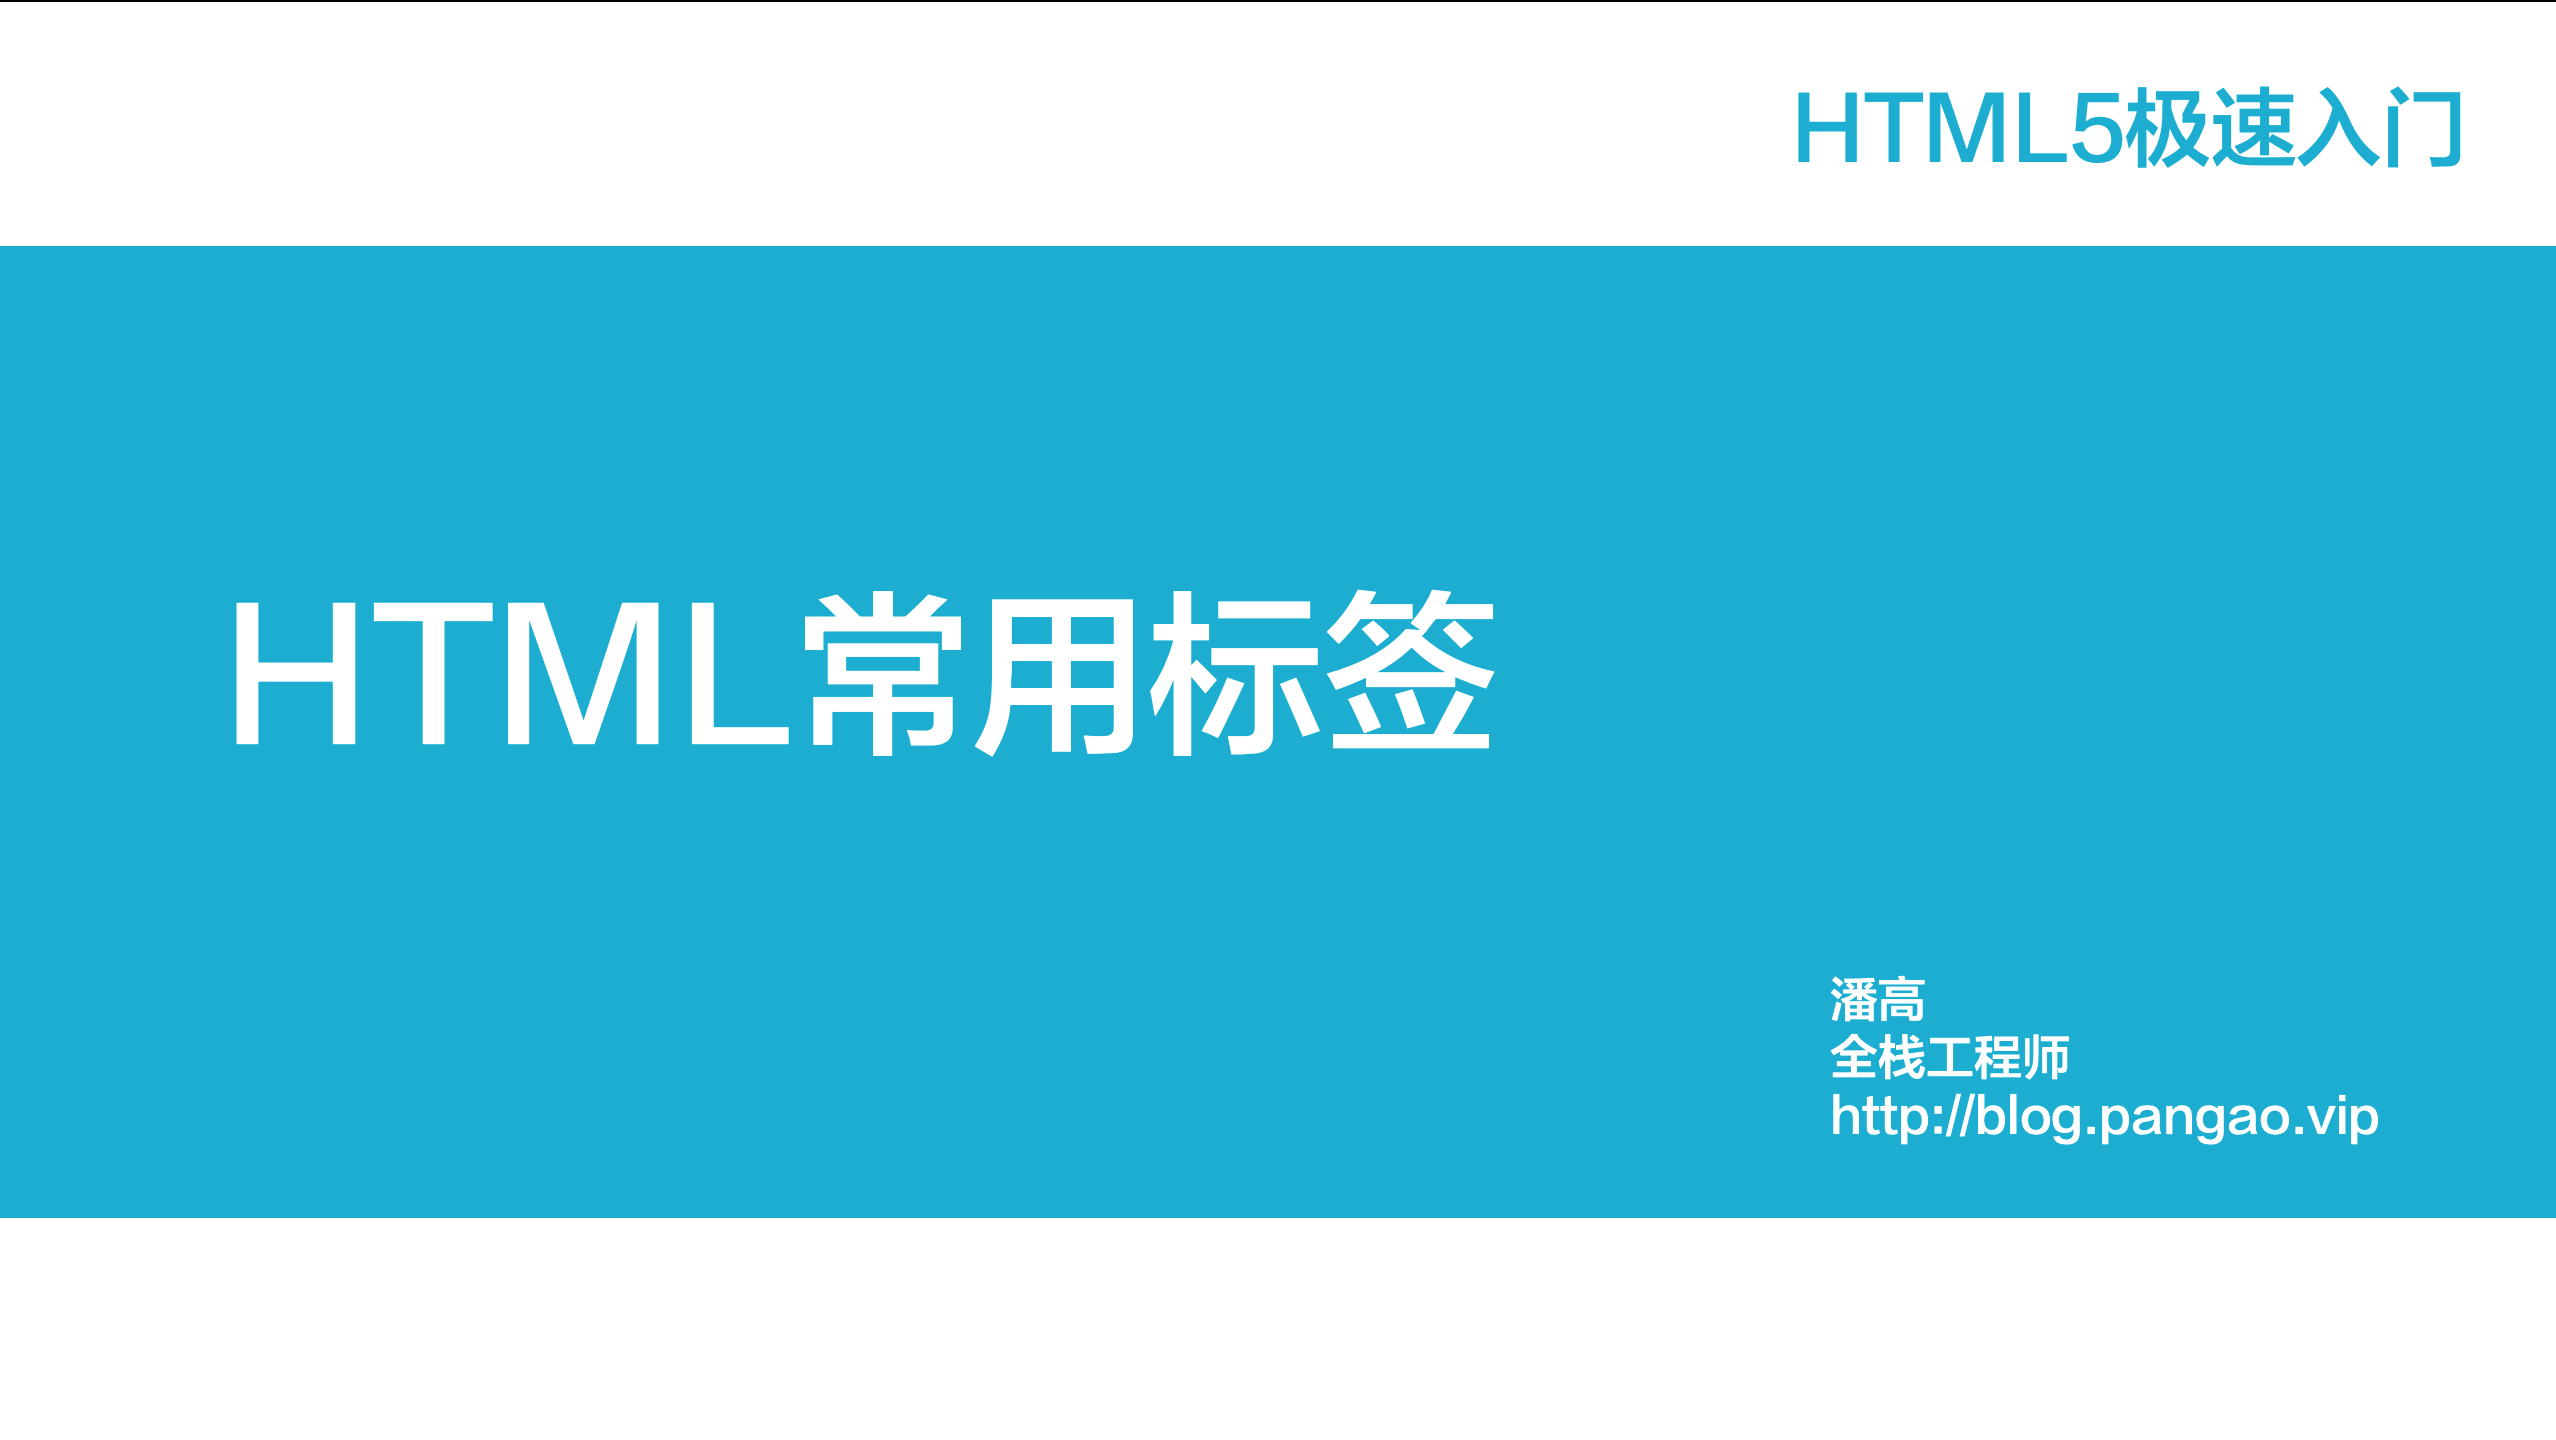 HTML5常用标签-HTML5极速入门